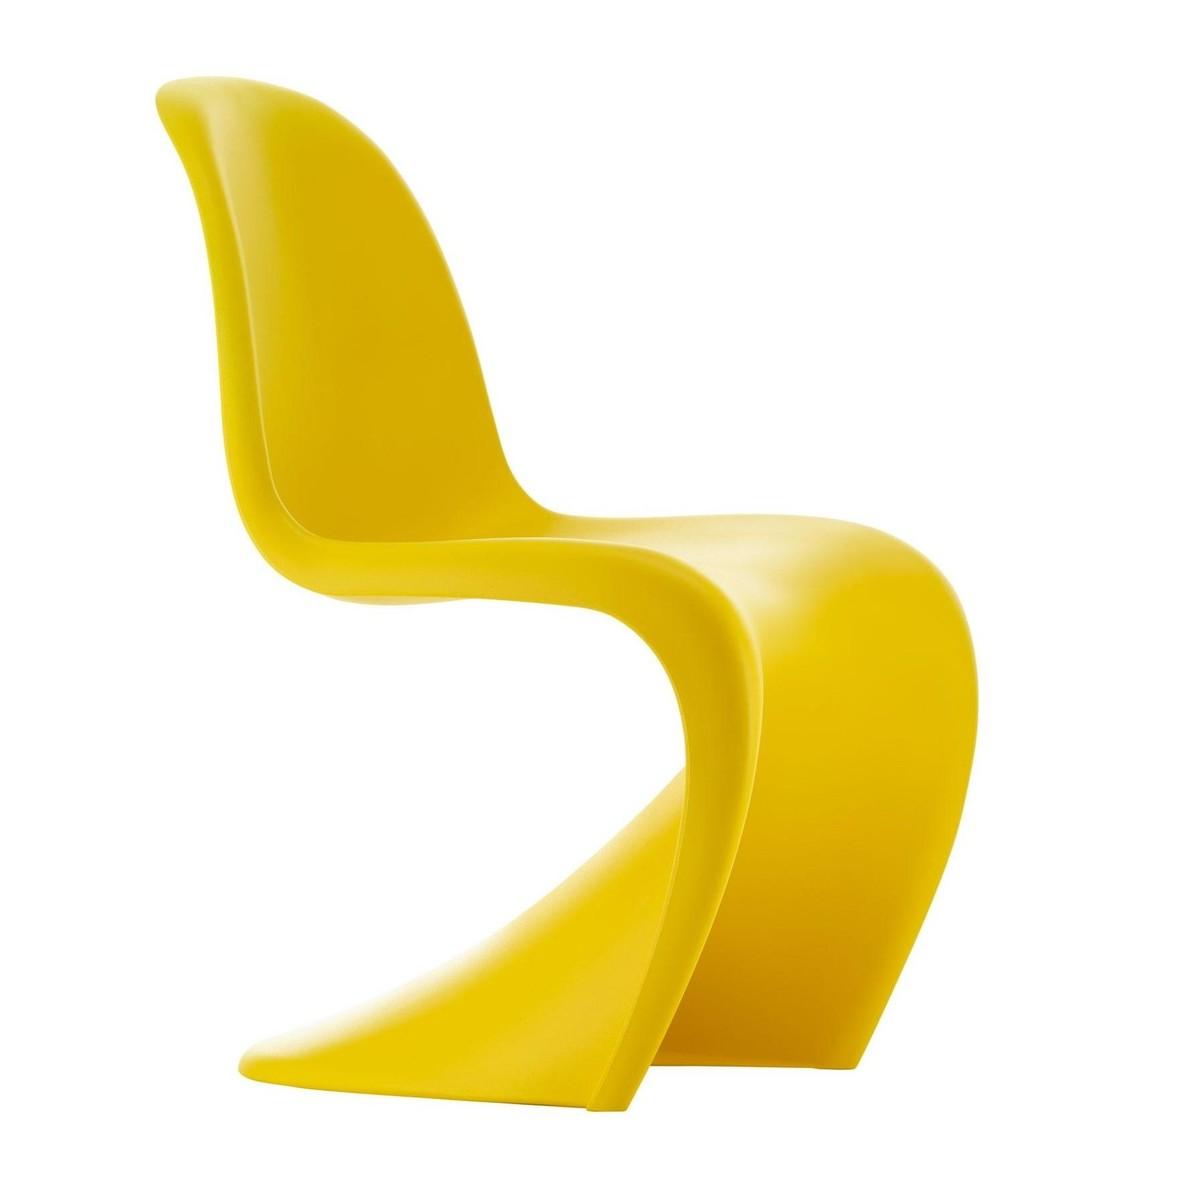 squarcina vitra panton chair squarcina. Black Bedroom Furniture Sets. Home Design Ideas